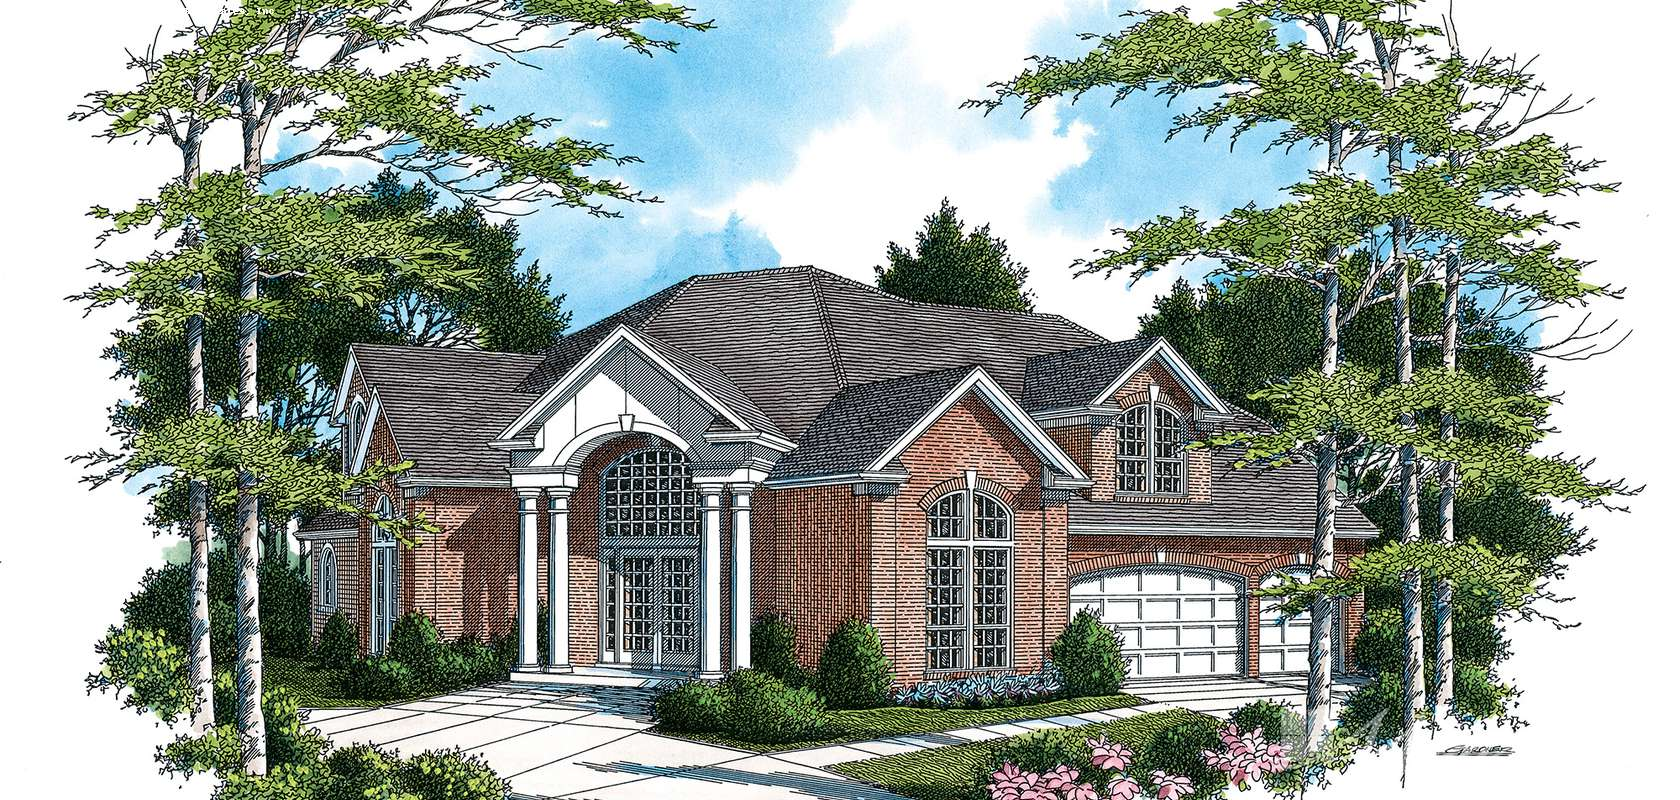 Mascord House Plan B2360: The Ingersoll